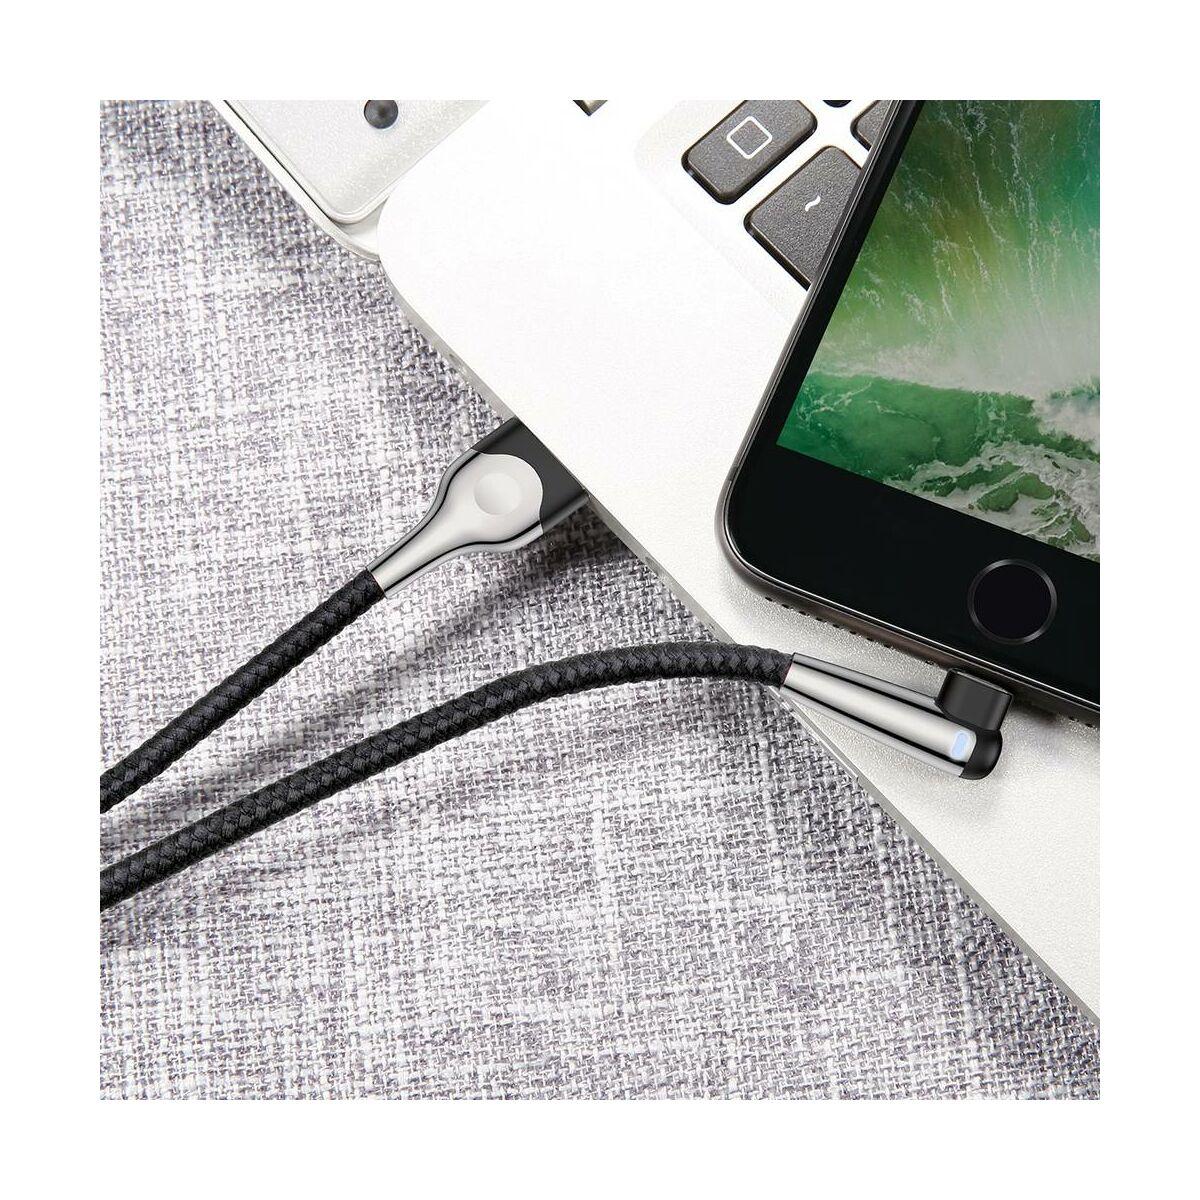 Baseus Lightning kábel, Sharp-bird Mobile Game, L-alakú csatlakozó, 1.5A, 2m, fekete (CALMVP-E01)